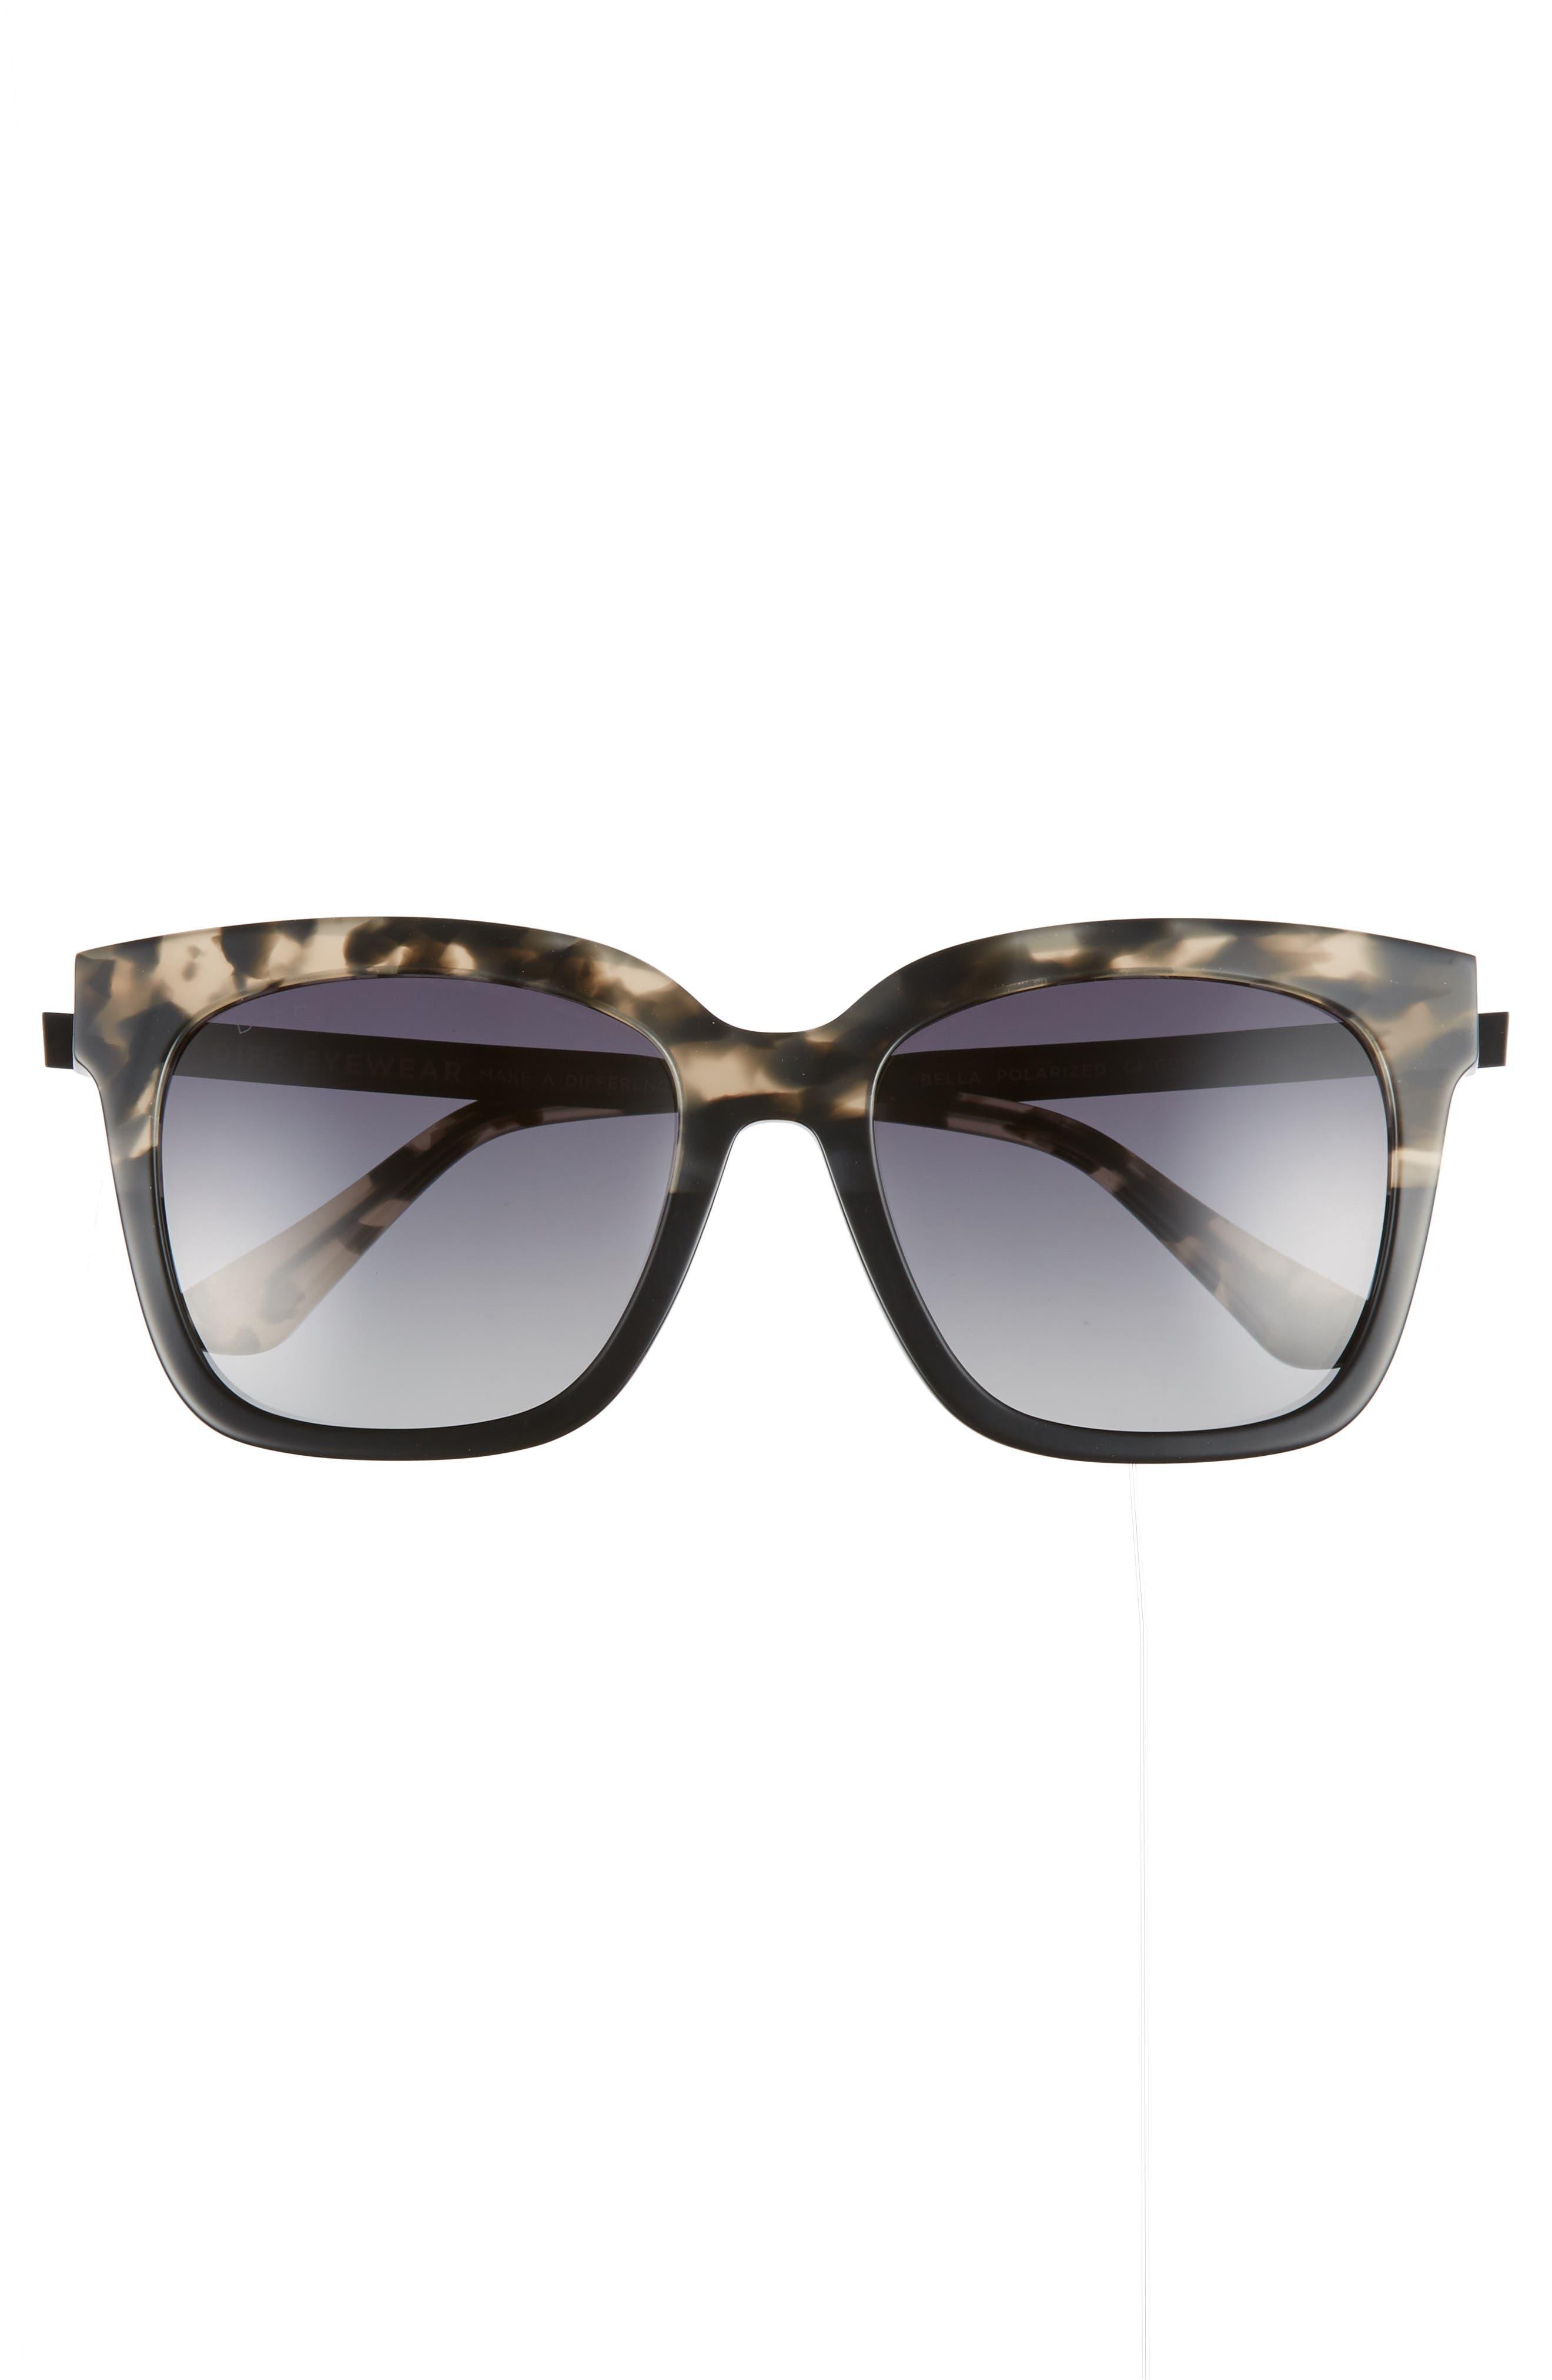 Bella 52mm Polarized Sunglasses,                             Alternate thumbnail 3, color,                             GREY FAGE/ GREY